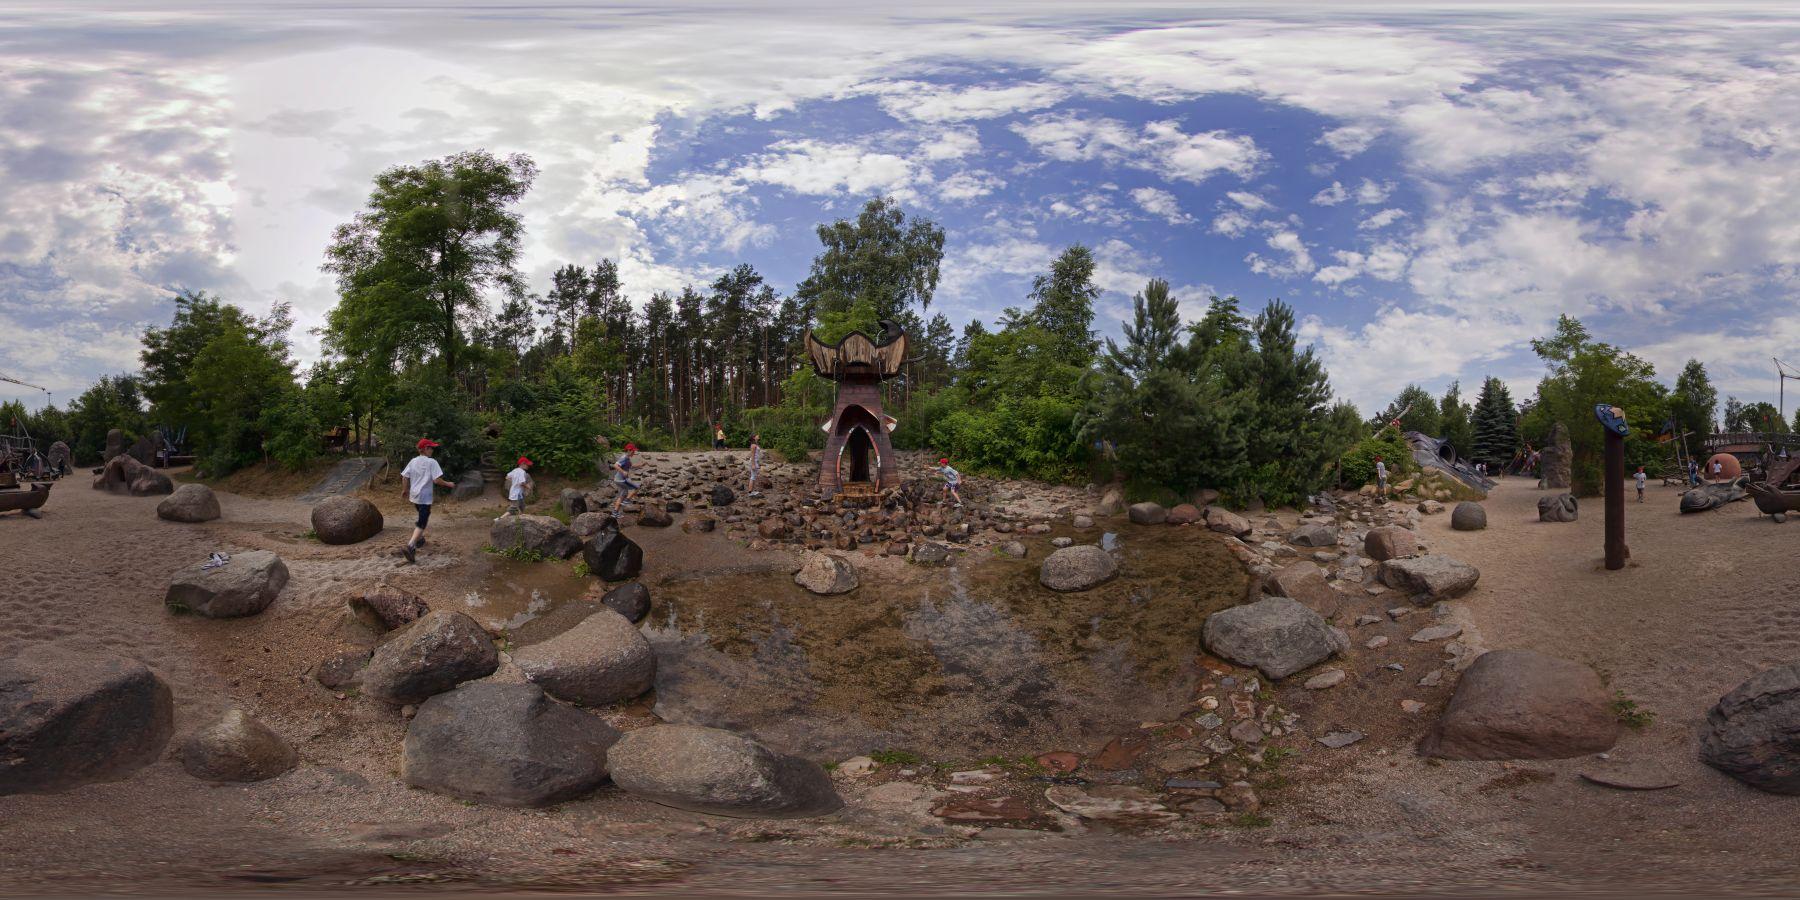 Kulturinsel Einsiedel 13